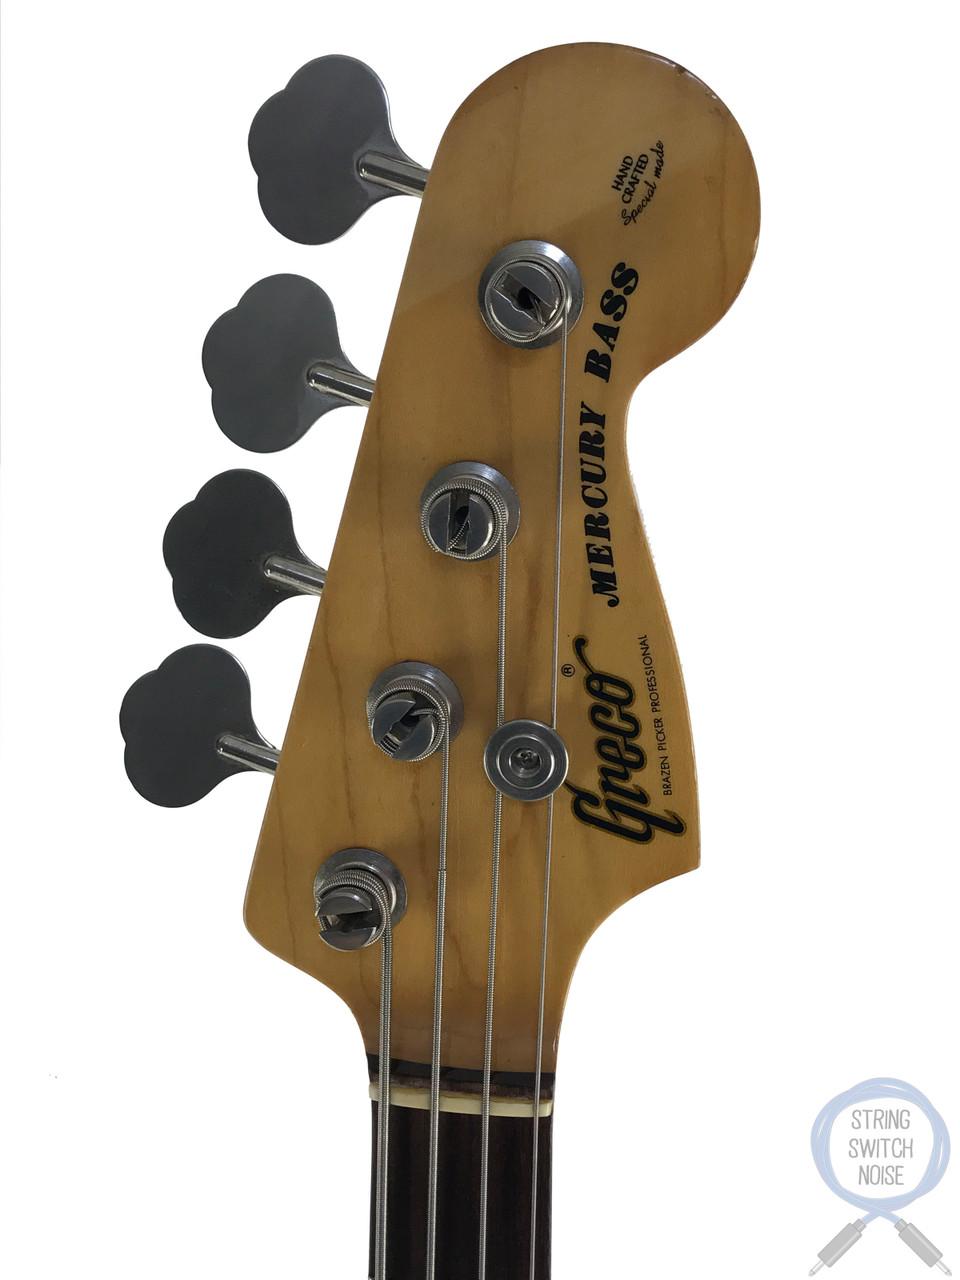 Greco Precision Bass, 1978 Vintage, Black Guard, Vintage White